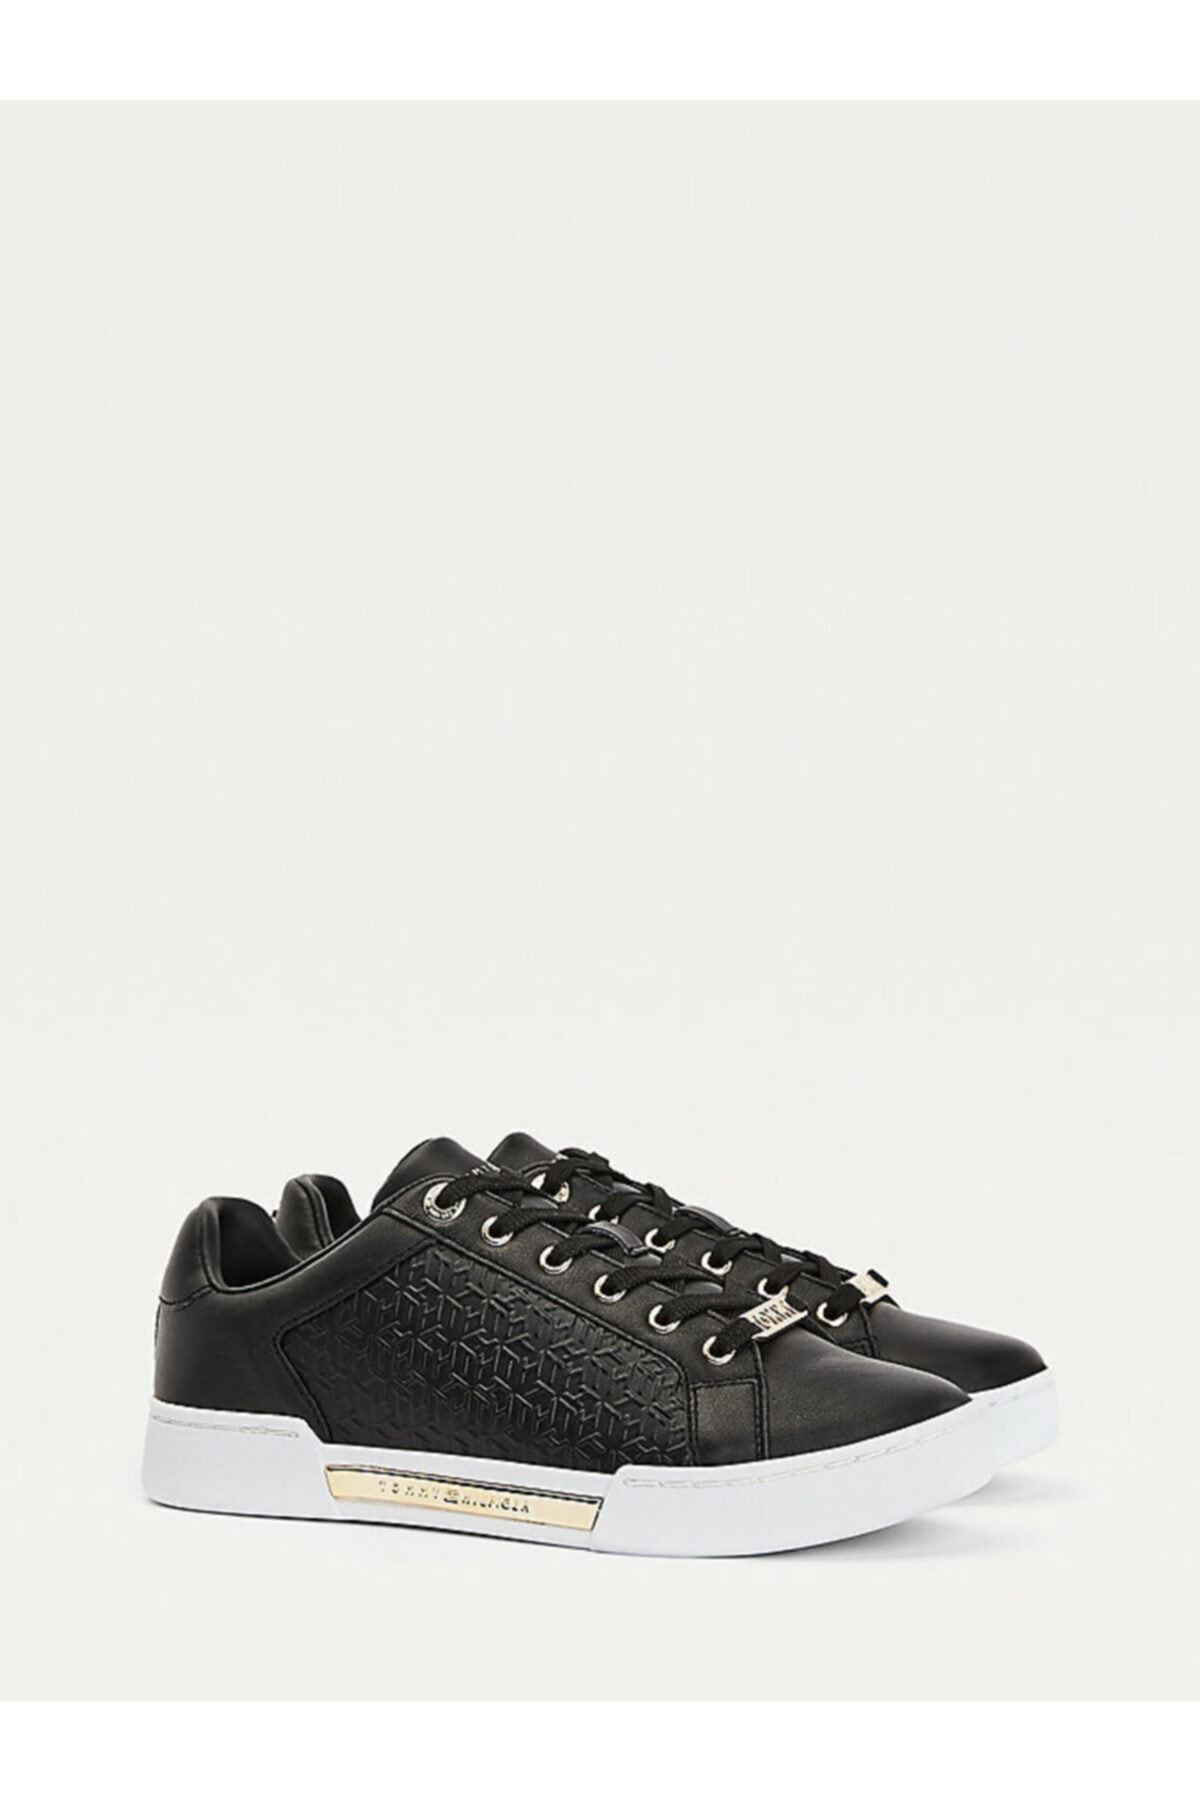 Tommy Hilfiger Th Monogram Elevated Sneaker 1